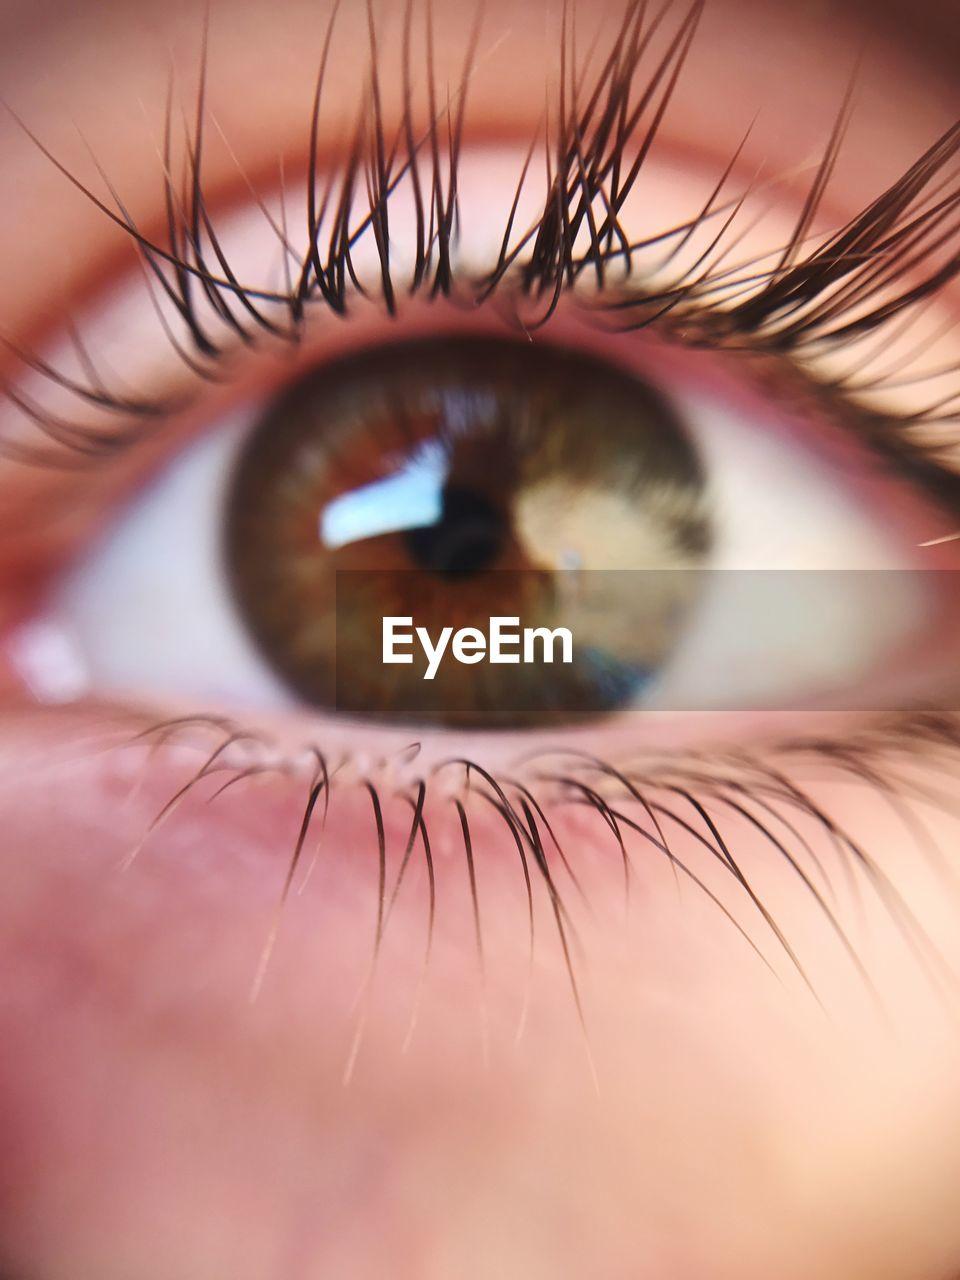 eyelash, human eye, real people, one person, human body part, sensory perception, eyesight, eyeball, macro, close-up, iris - eye, outdoors, day